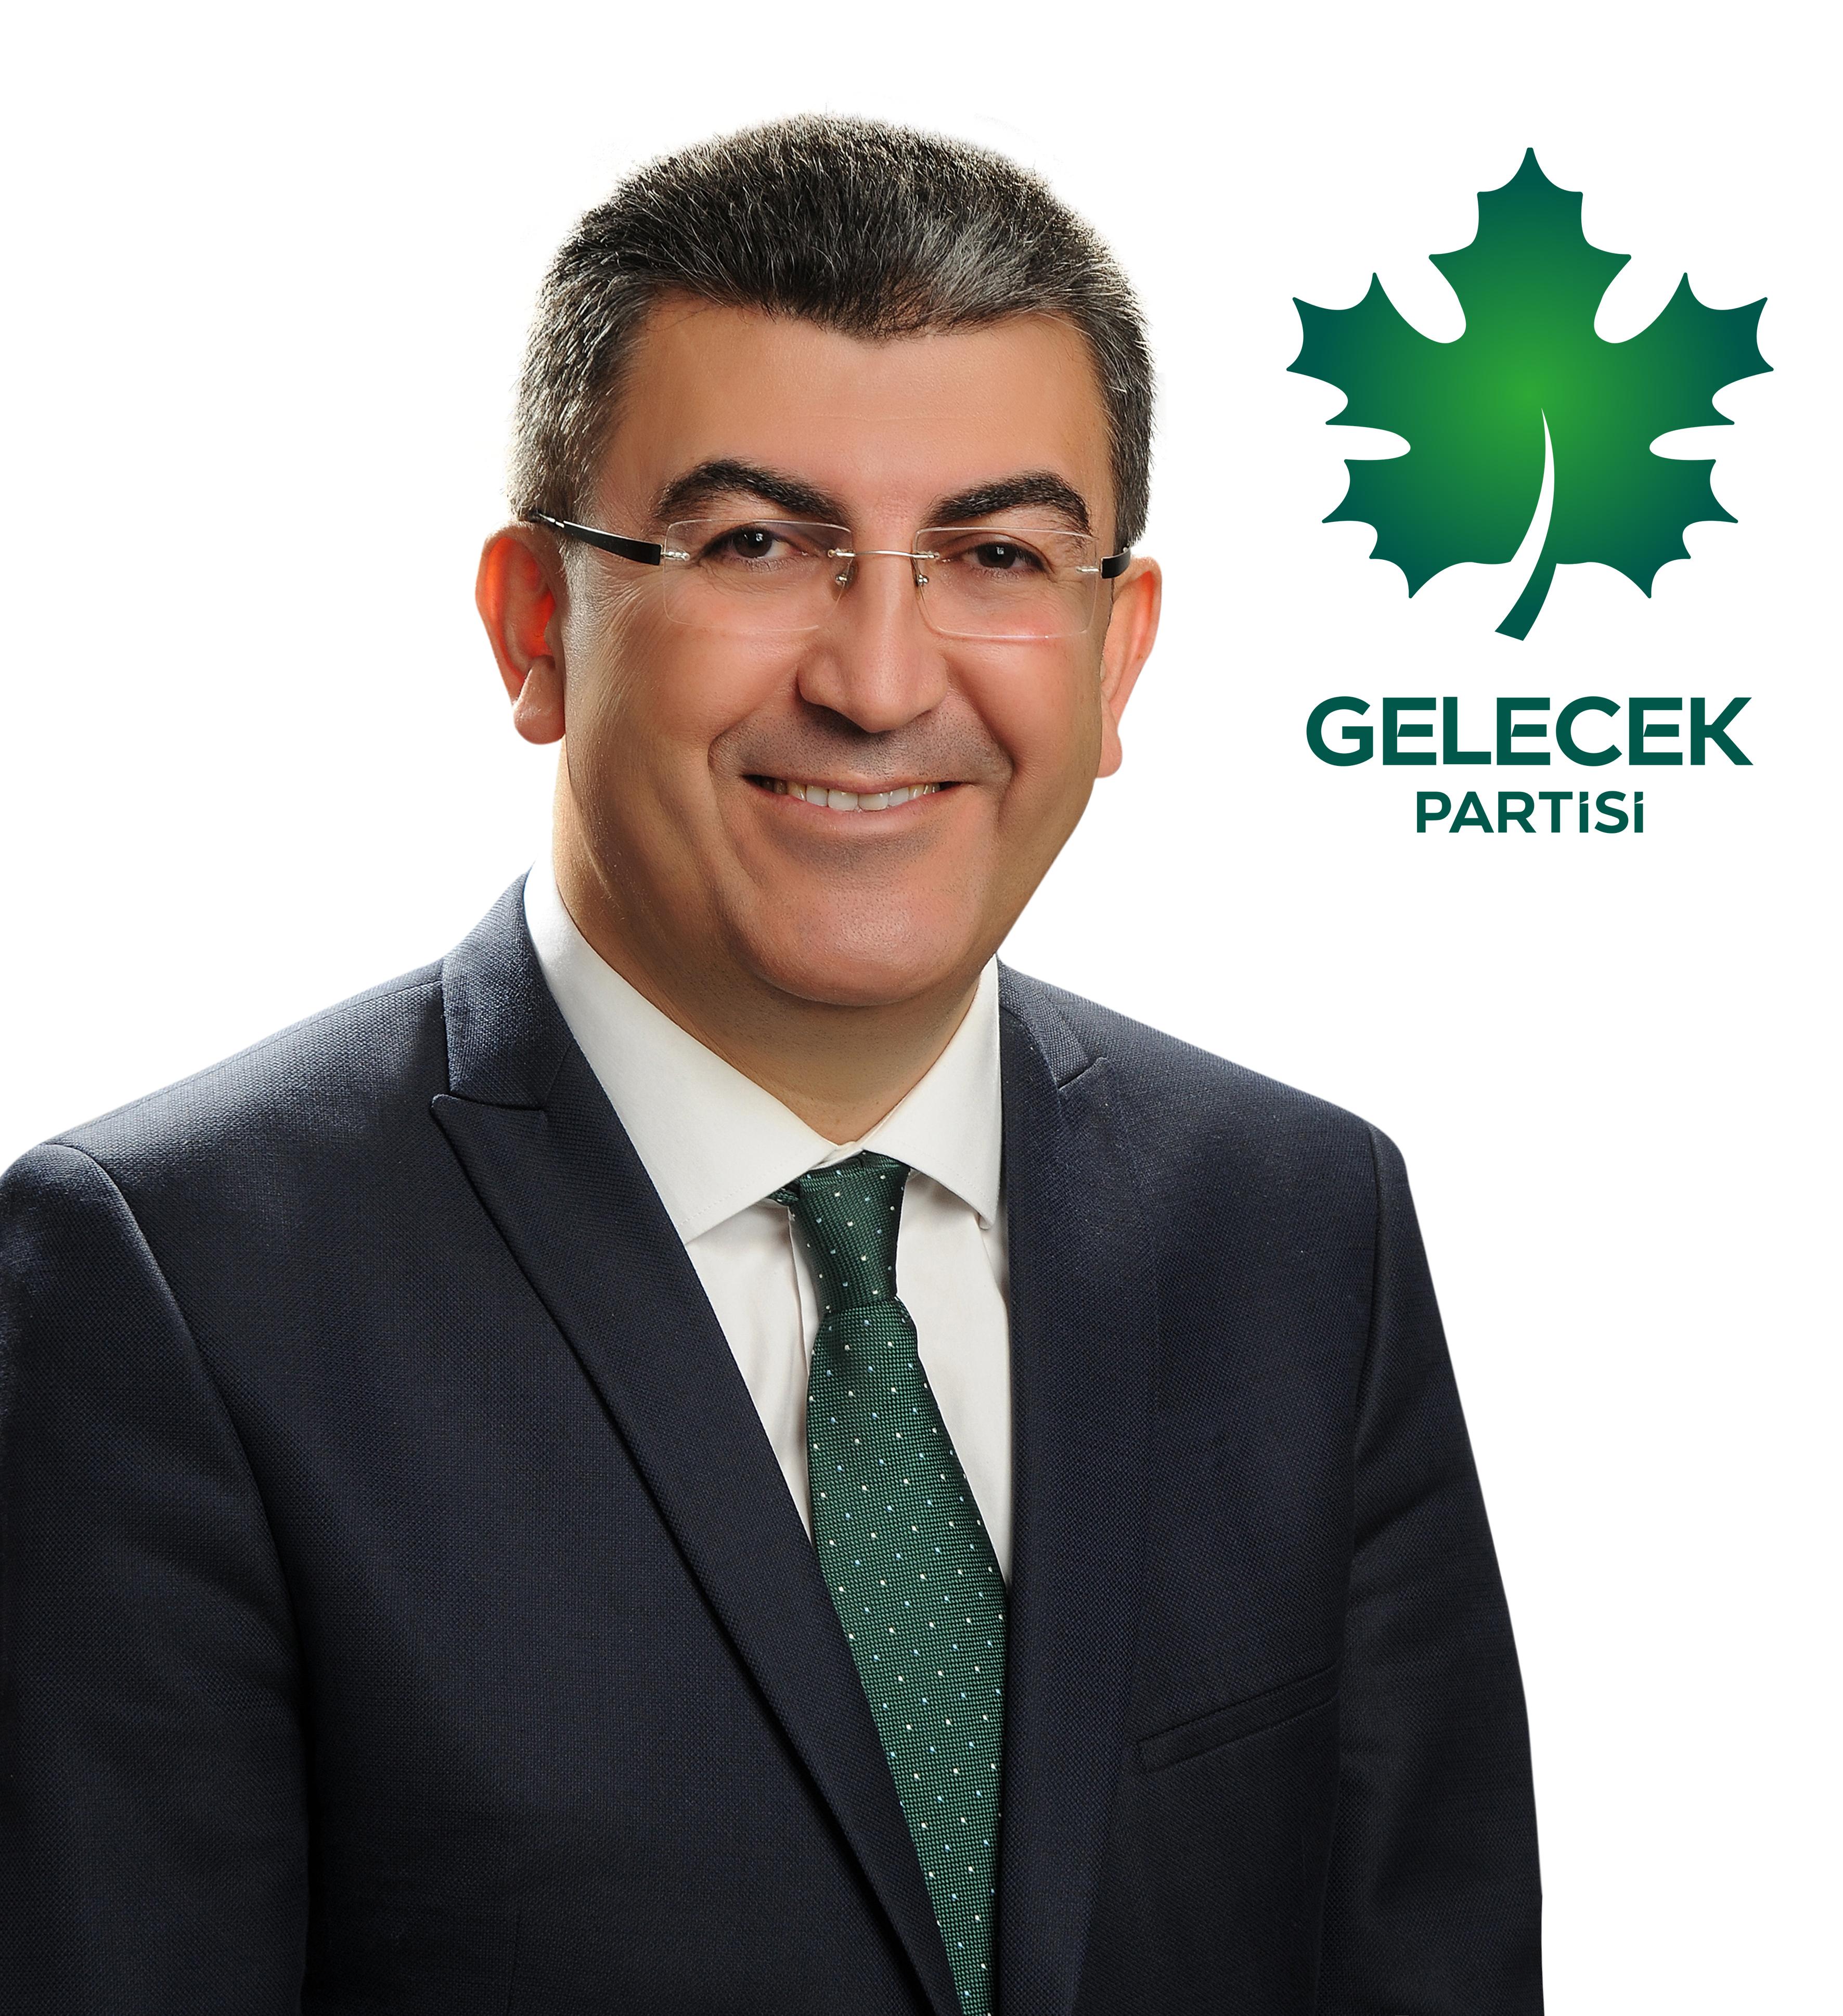 Hasan Ekici